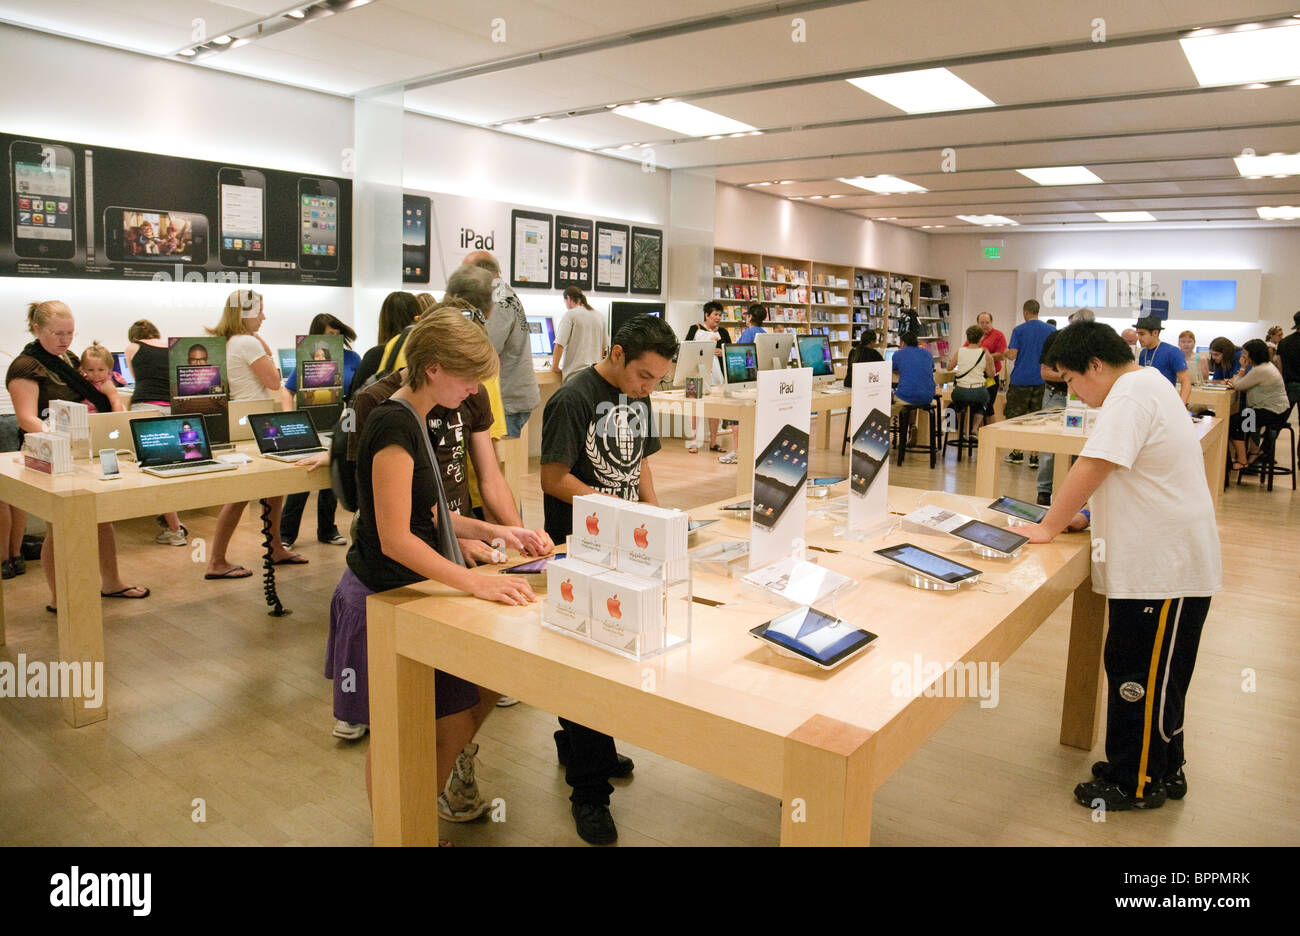 Apple Store Fashion Mall